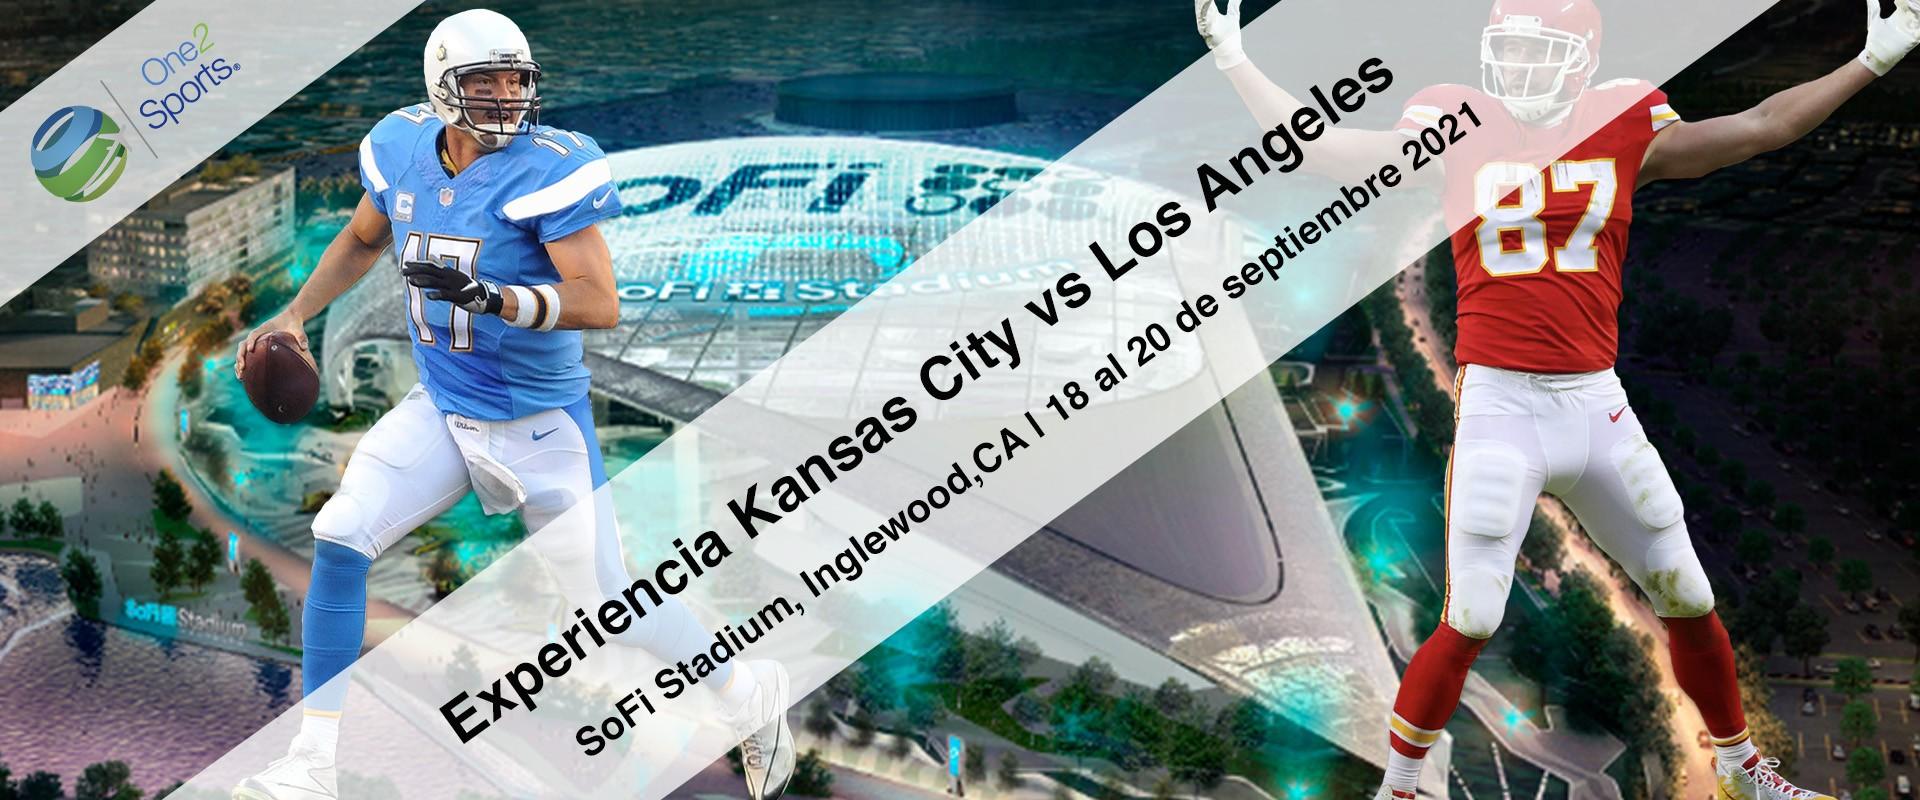 Los Angeles Chargers vs Kansas City